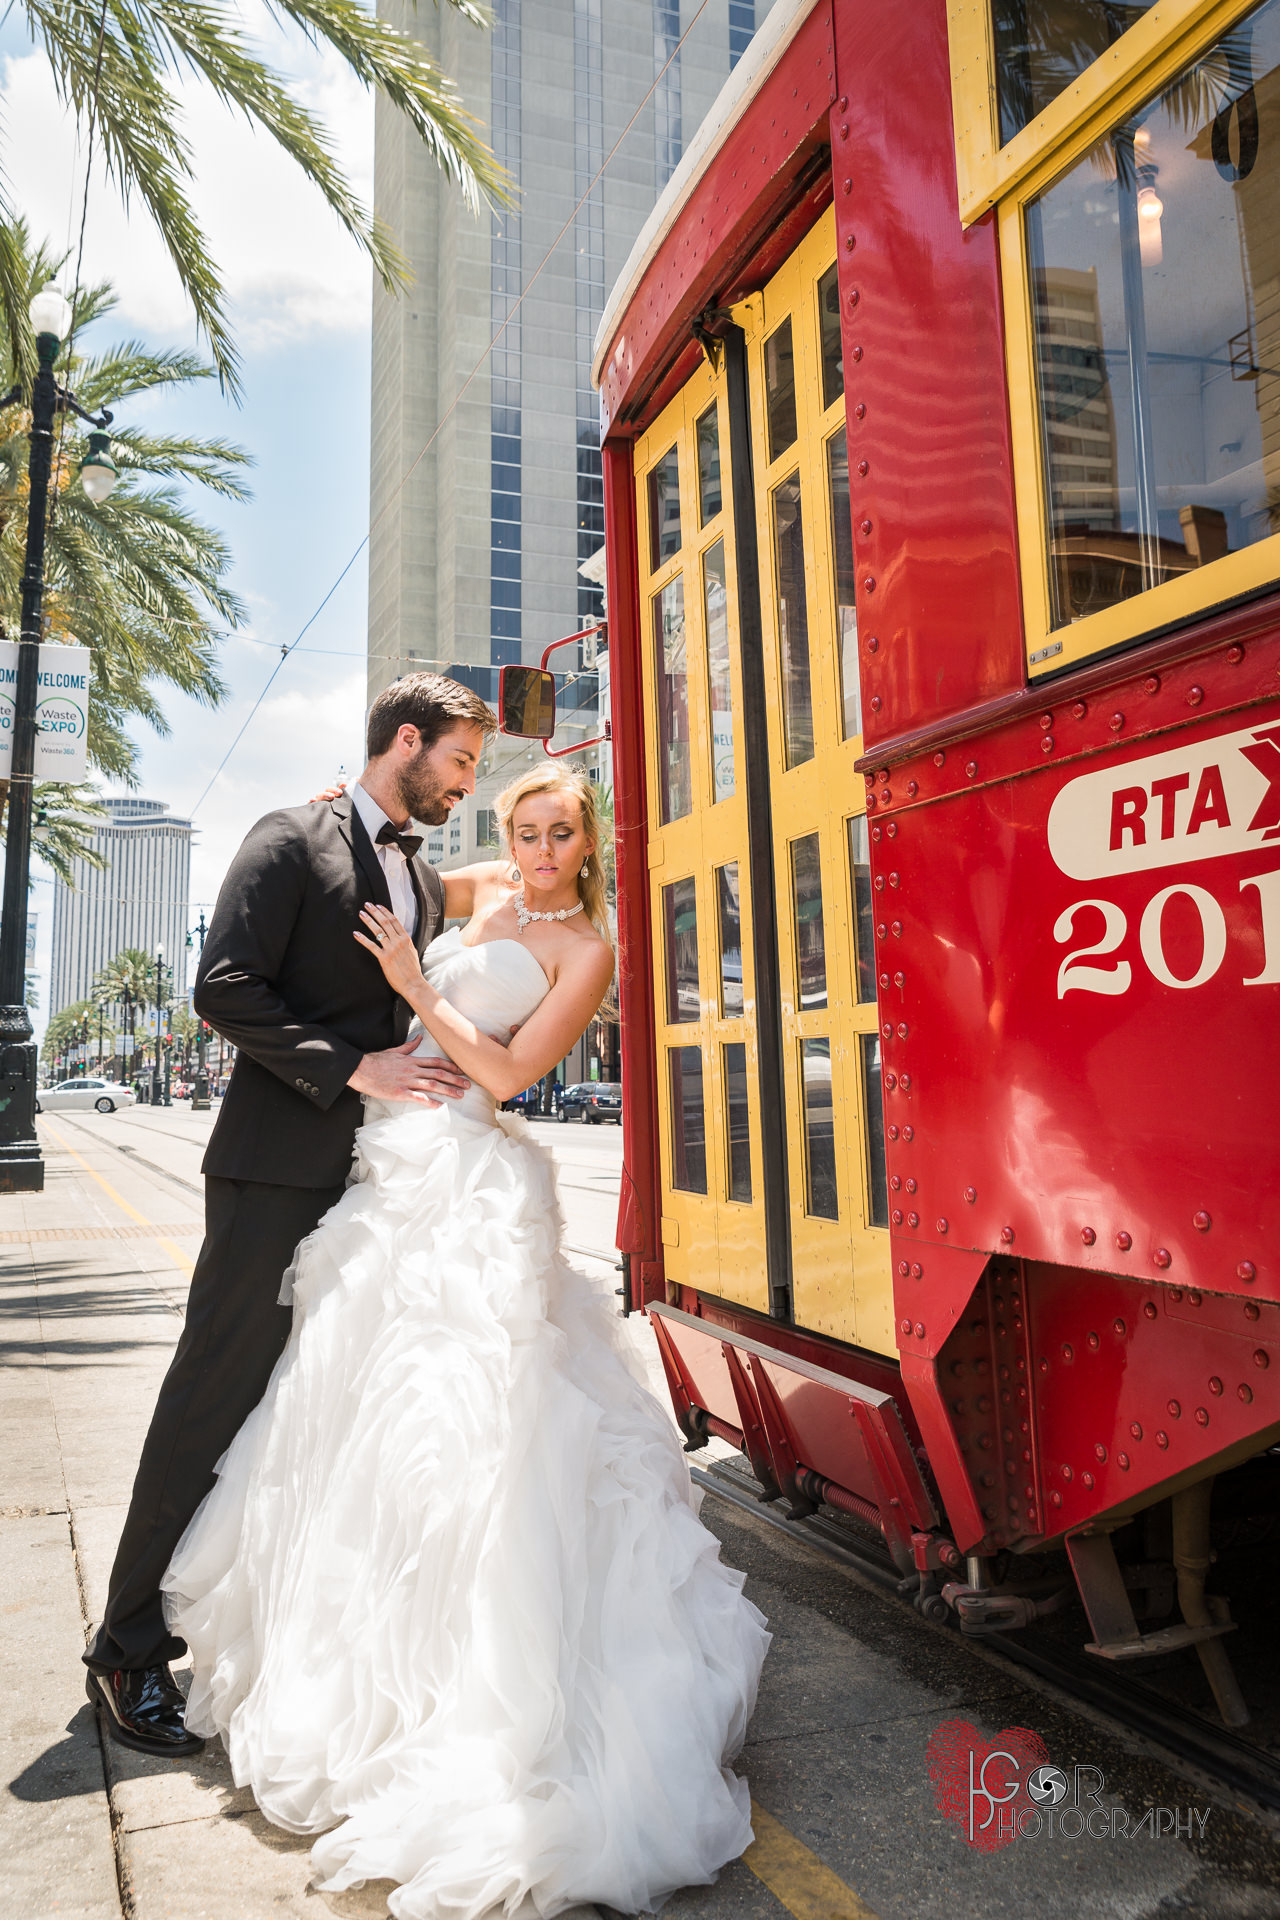 New Orleans Streetcar wedding